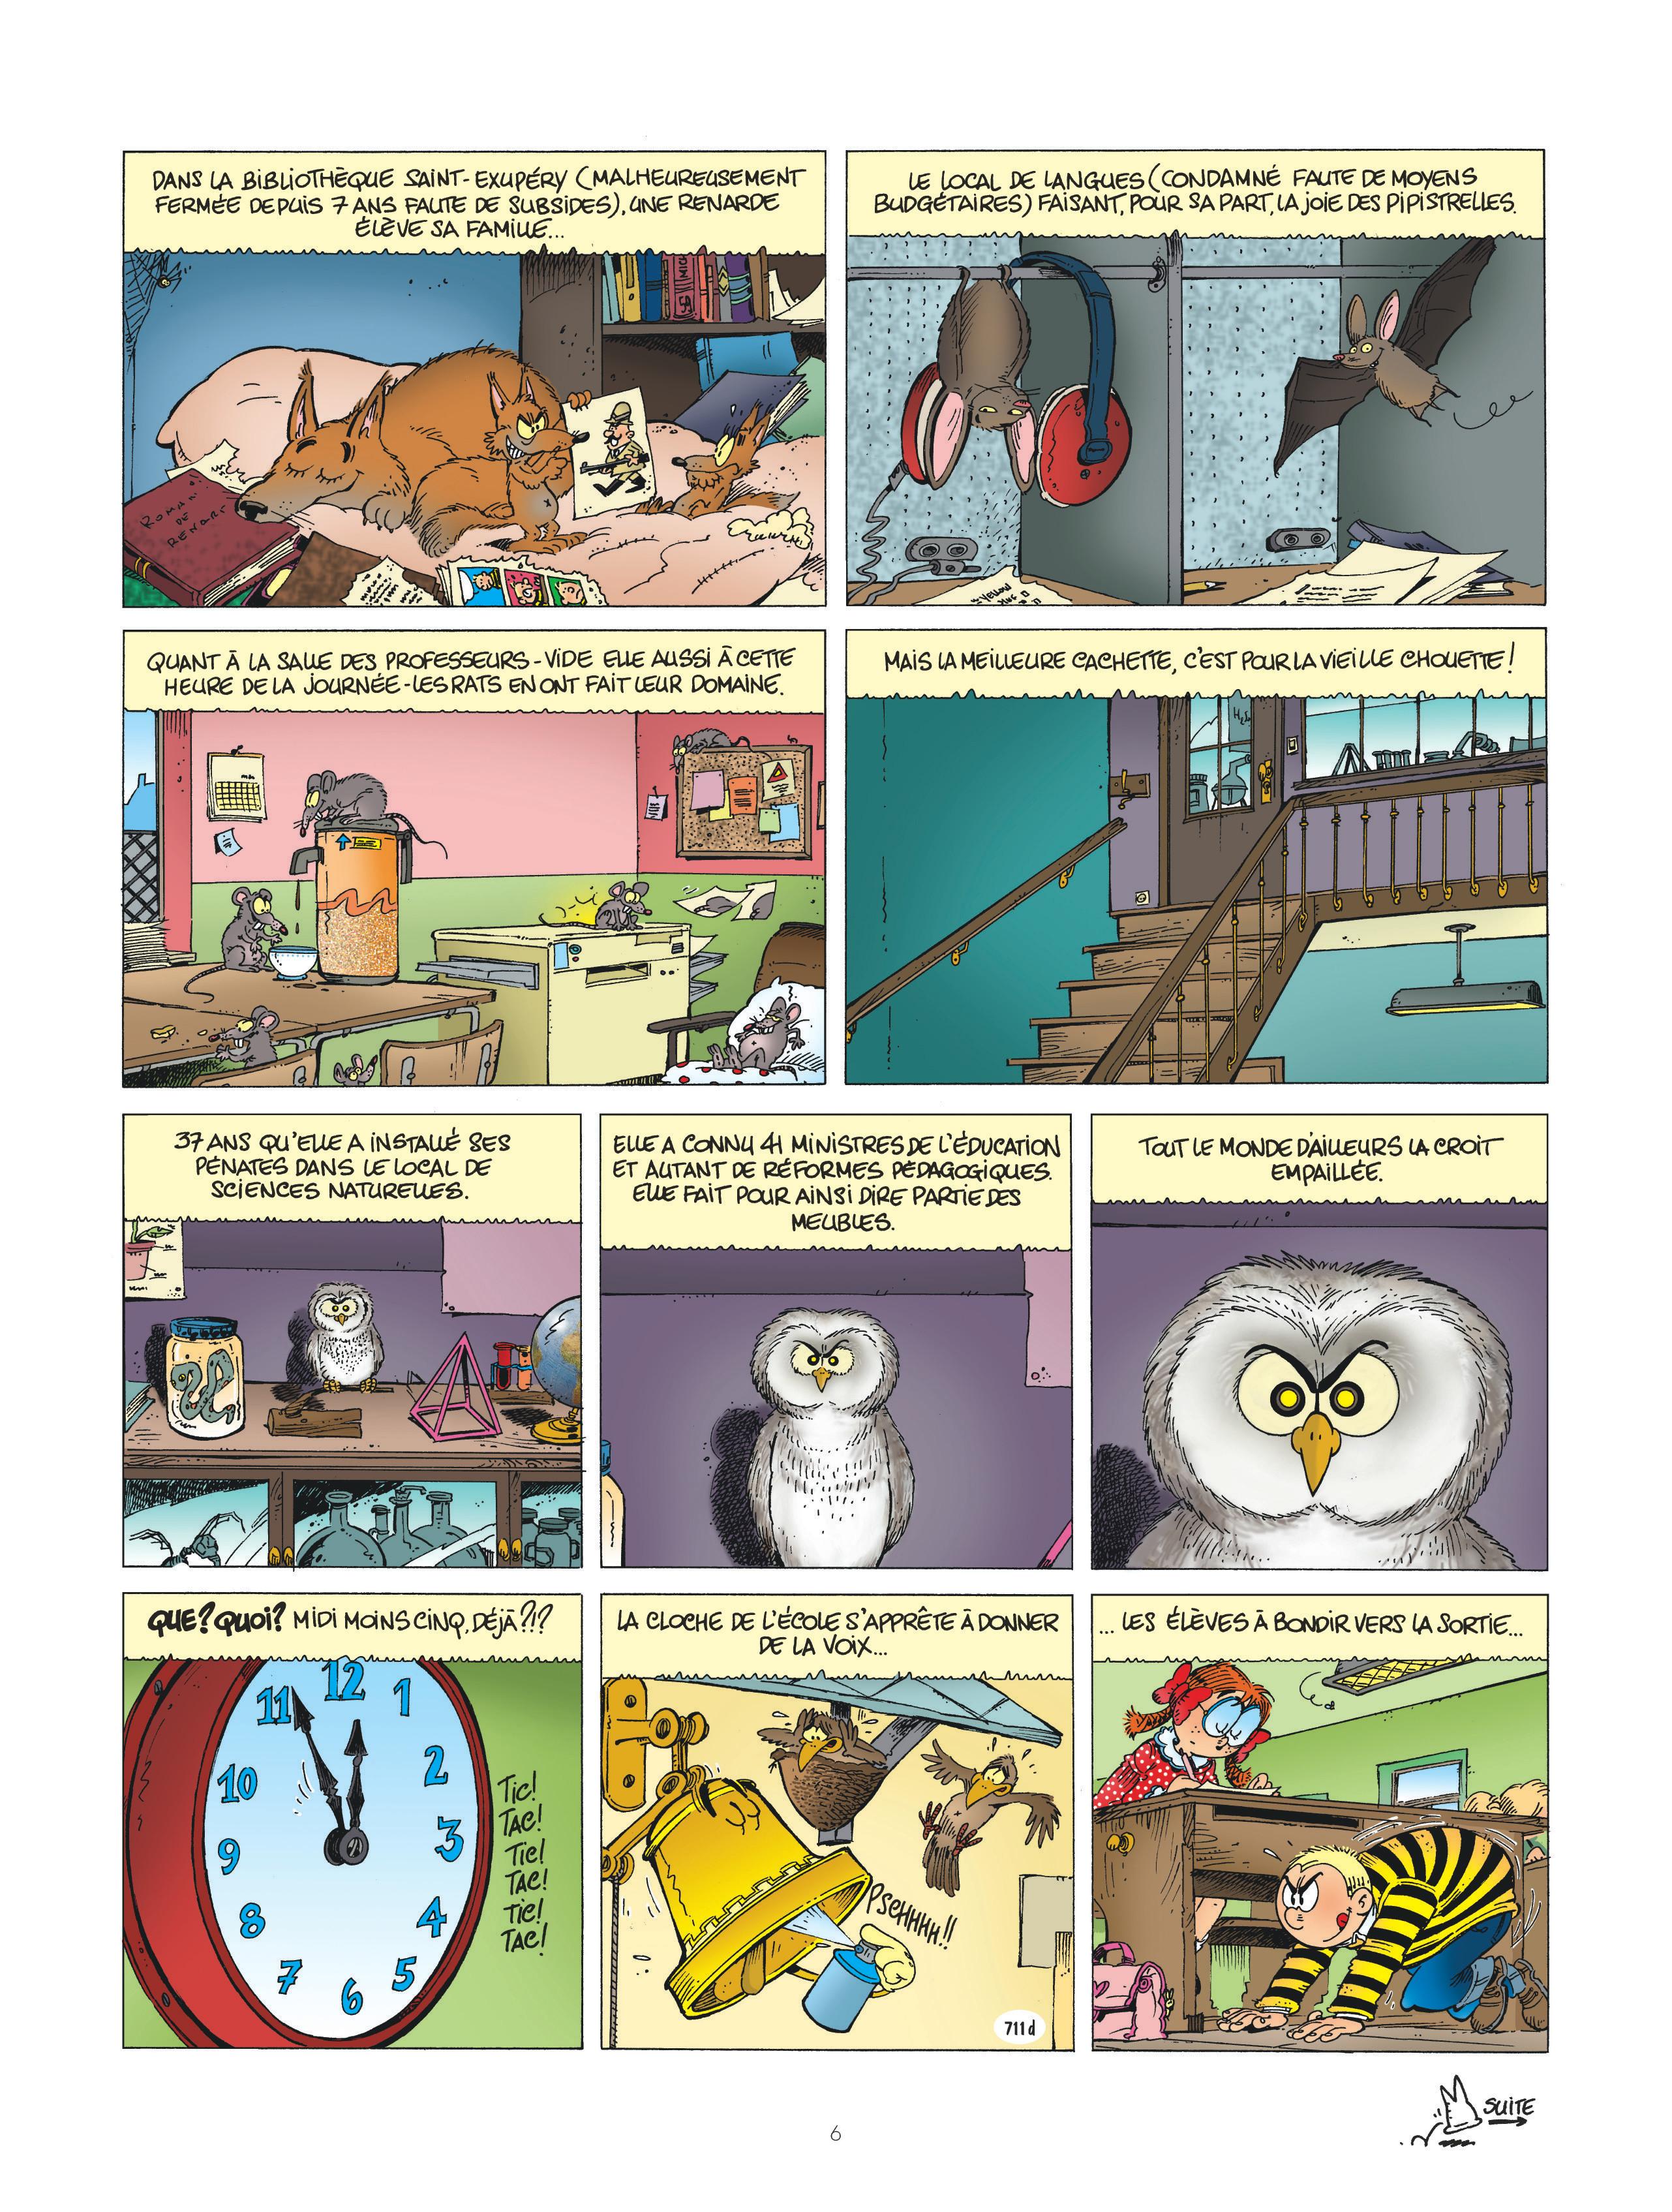 ducobu#20_Page 6